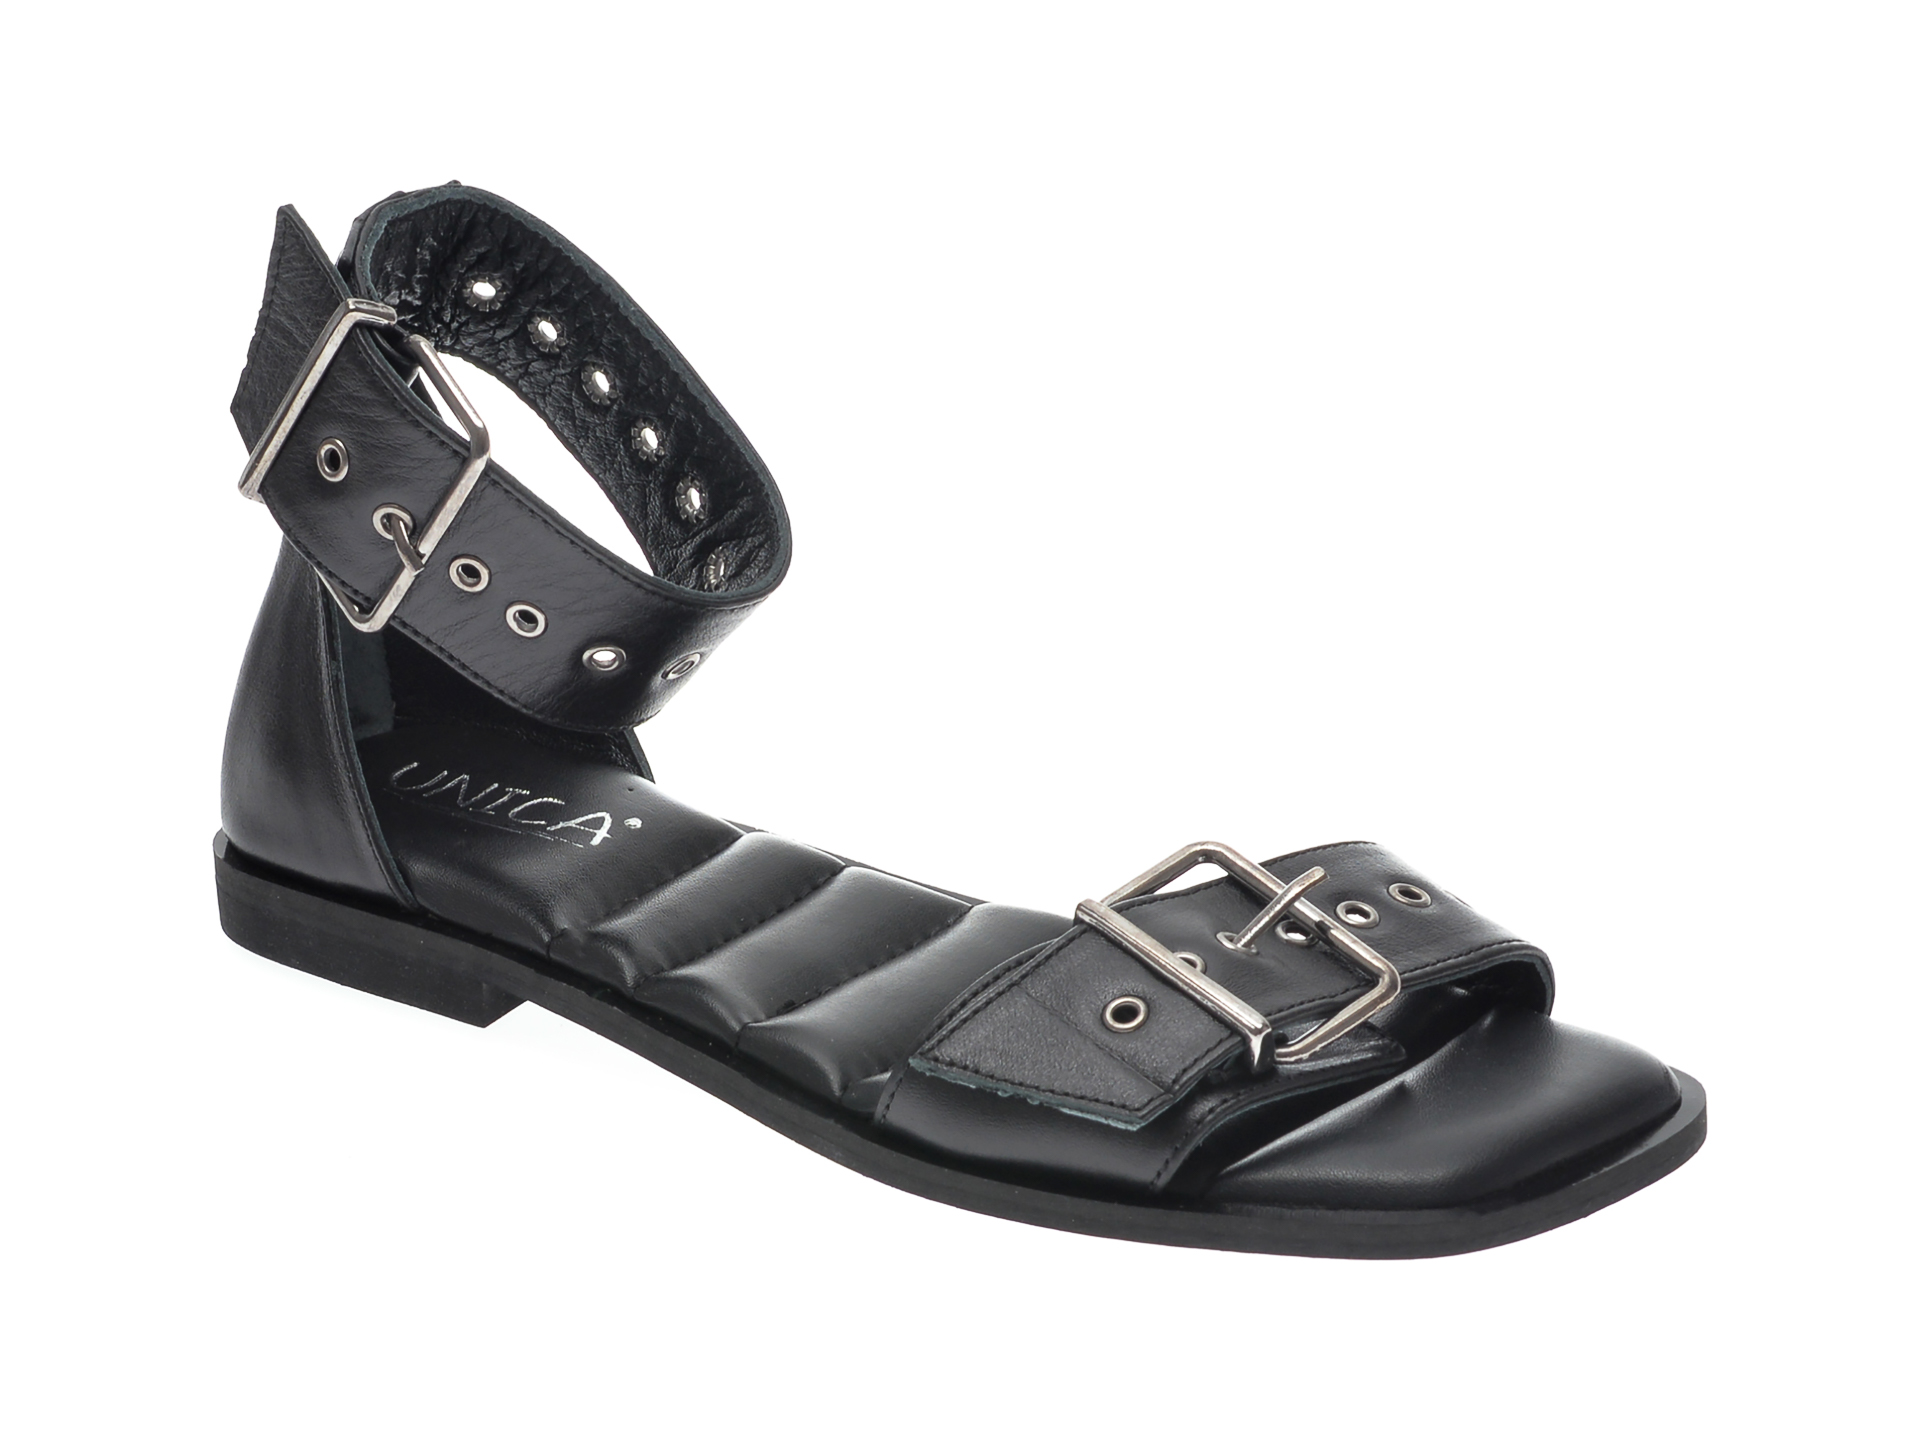 Sandale UNICA negre, A6796, din piele naturala